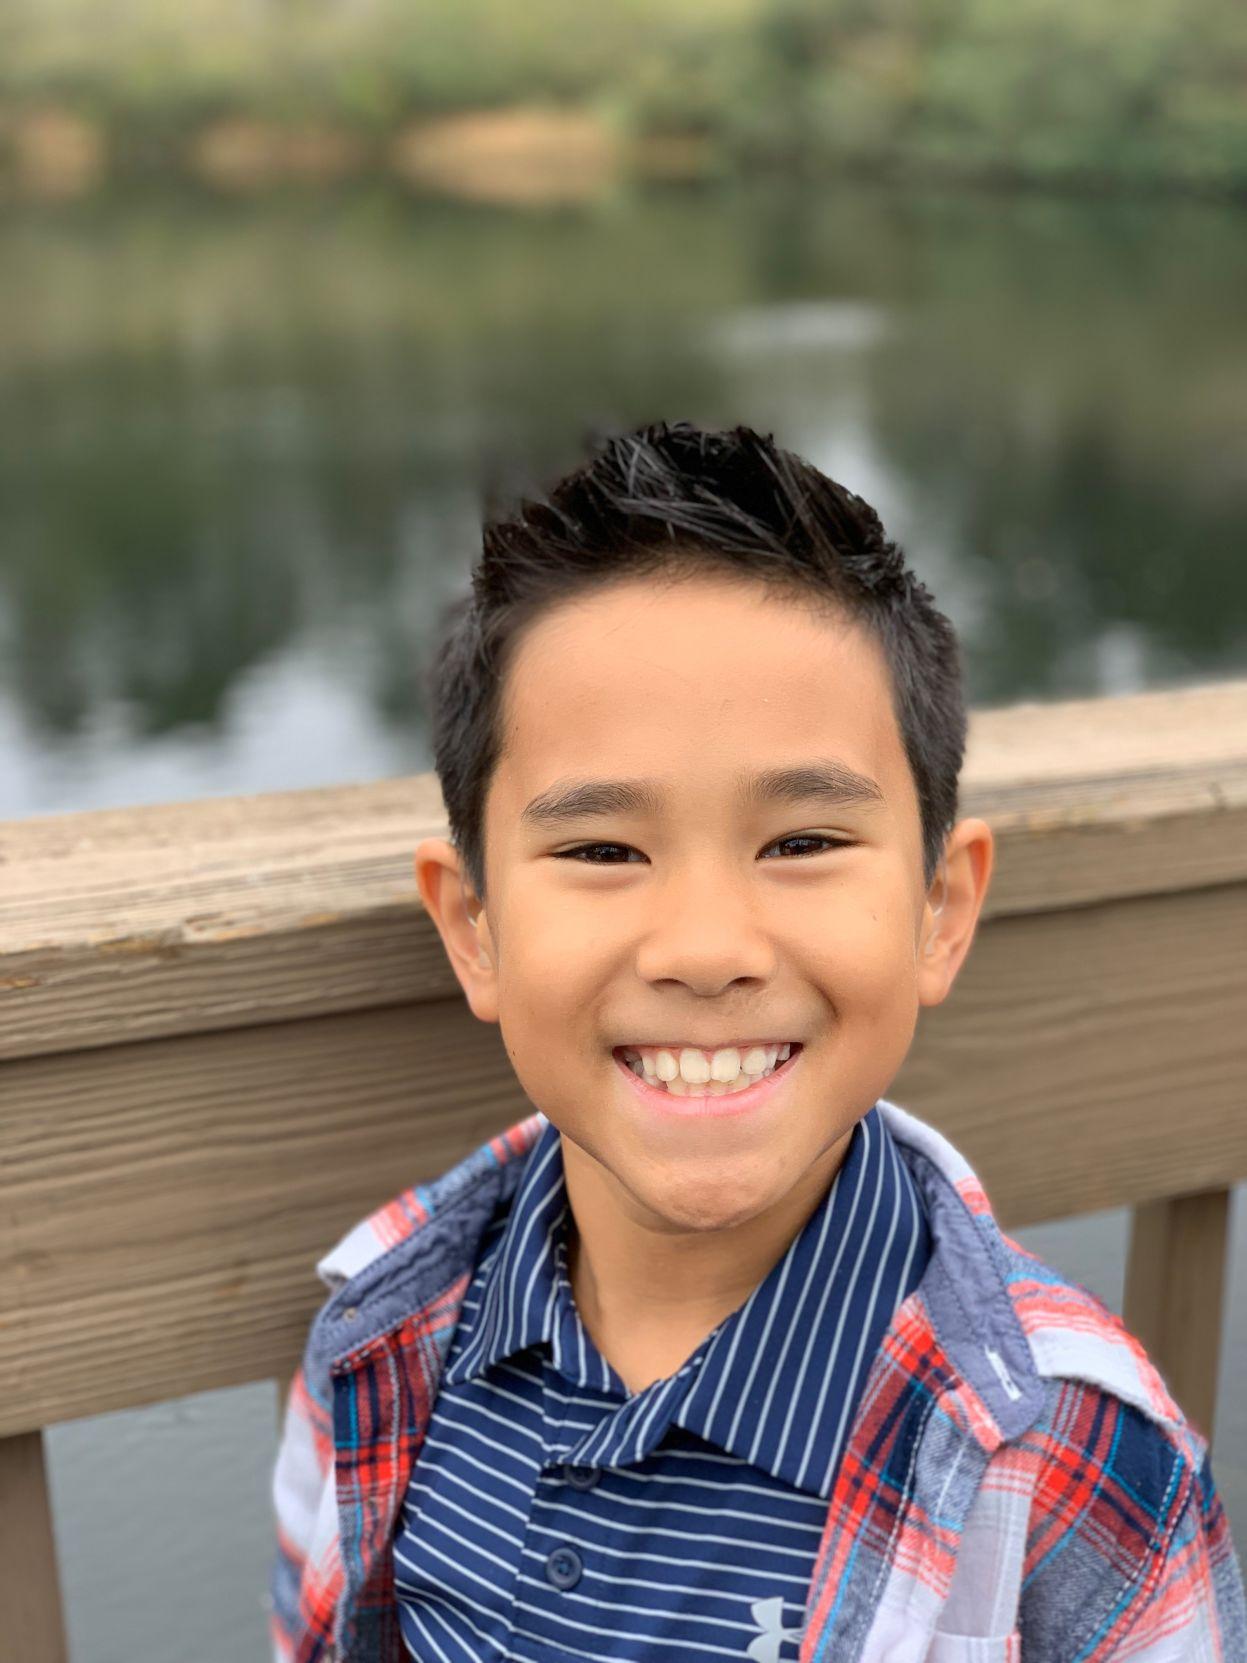 Mansfield nonprofit gifts Florida boy wish list trip, family pays it forward to Ohio boy